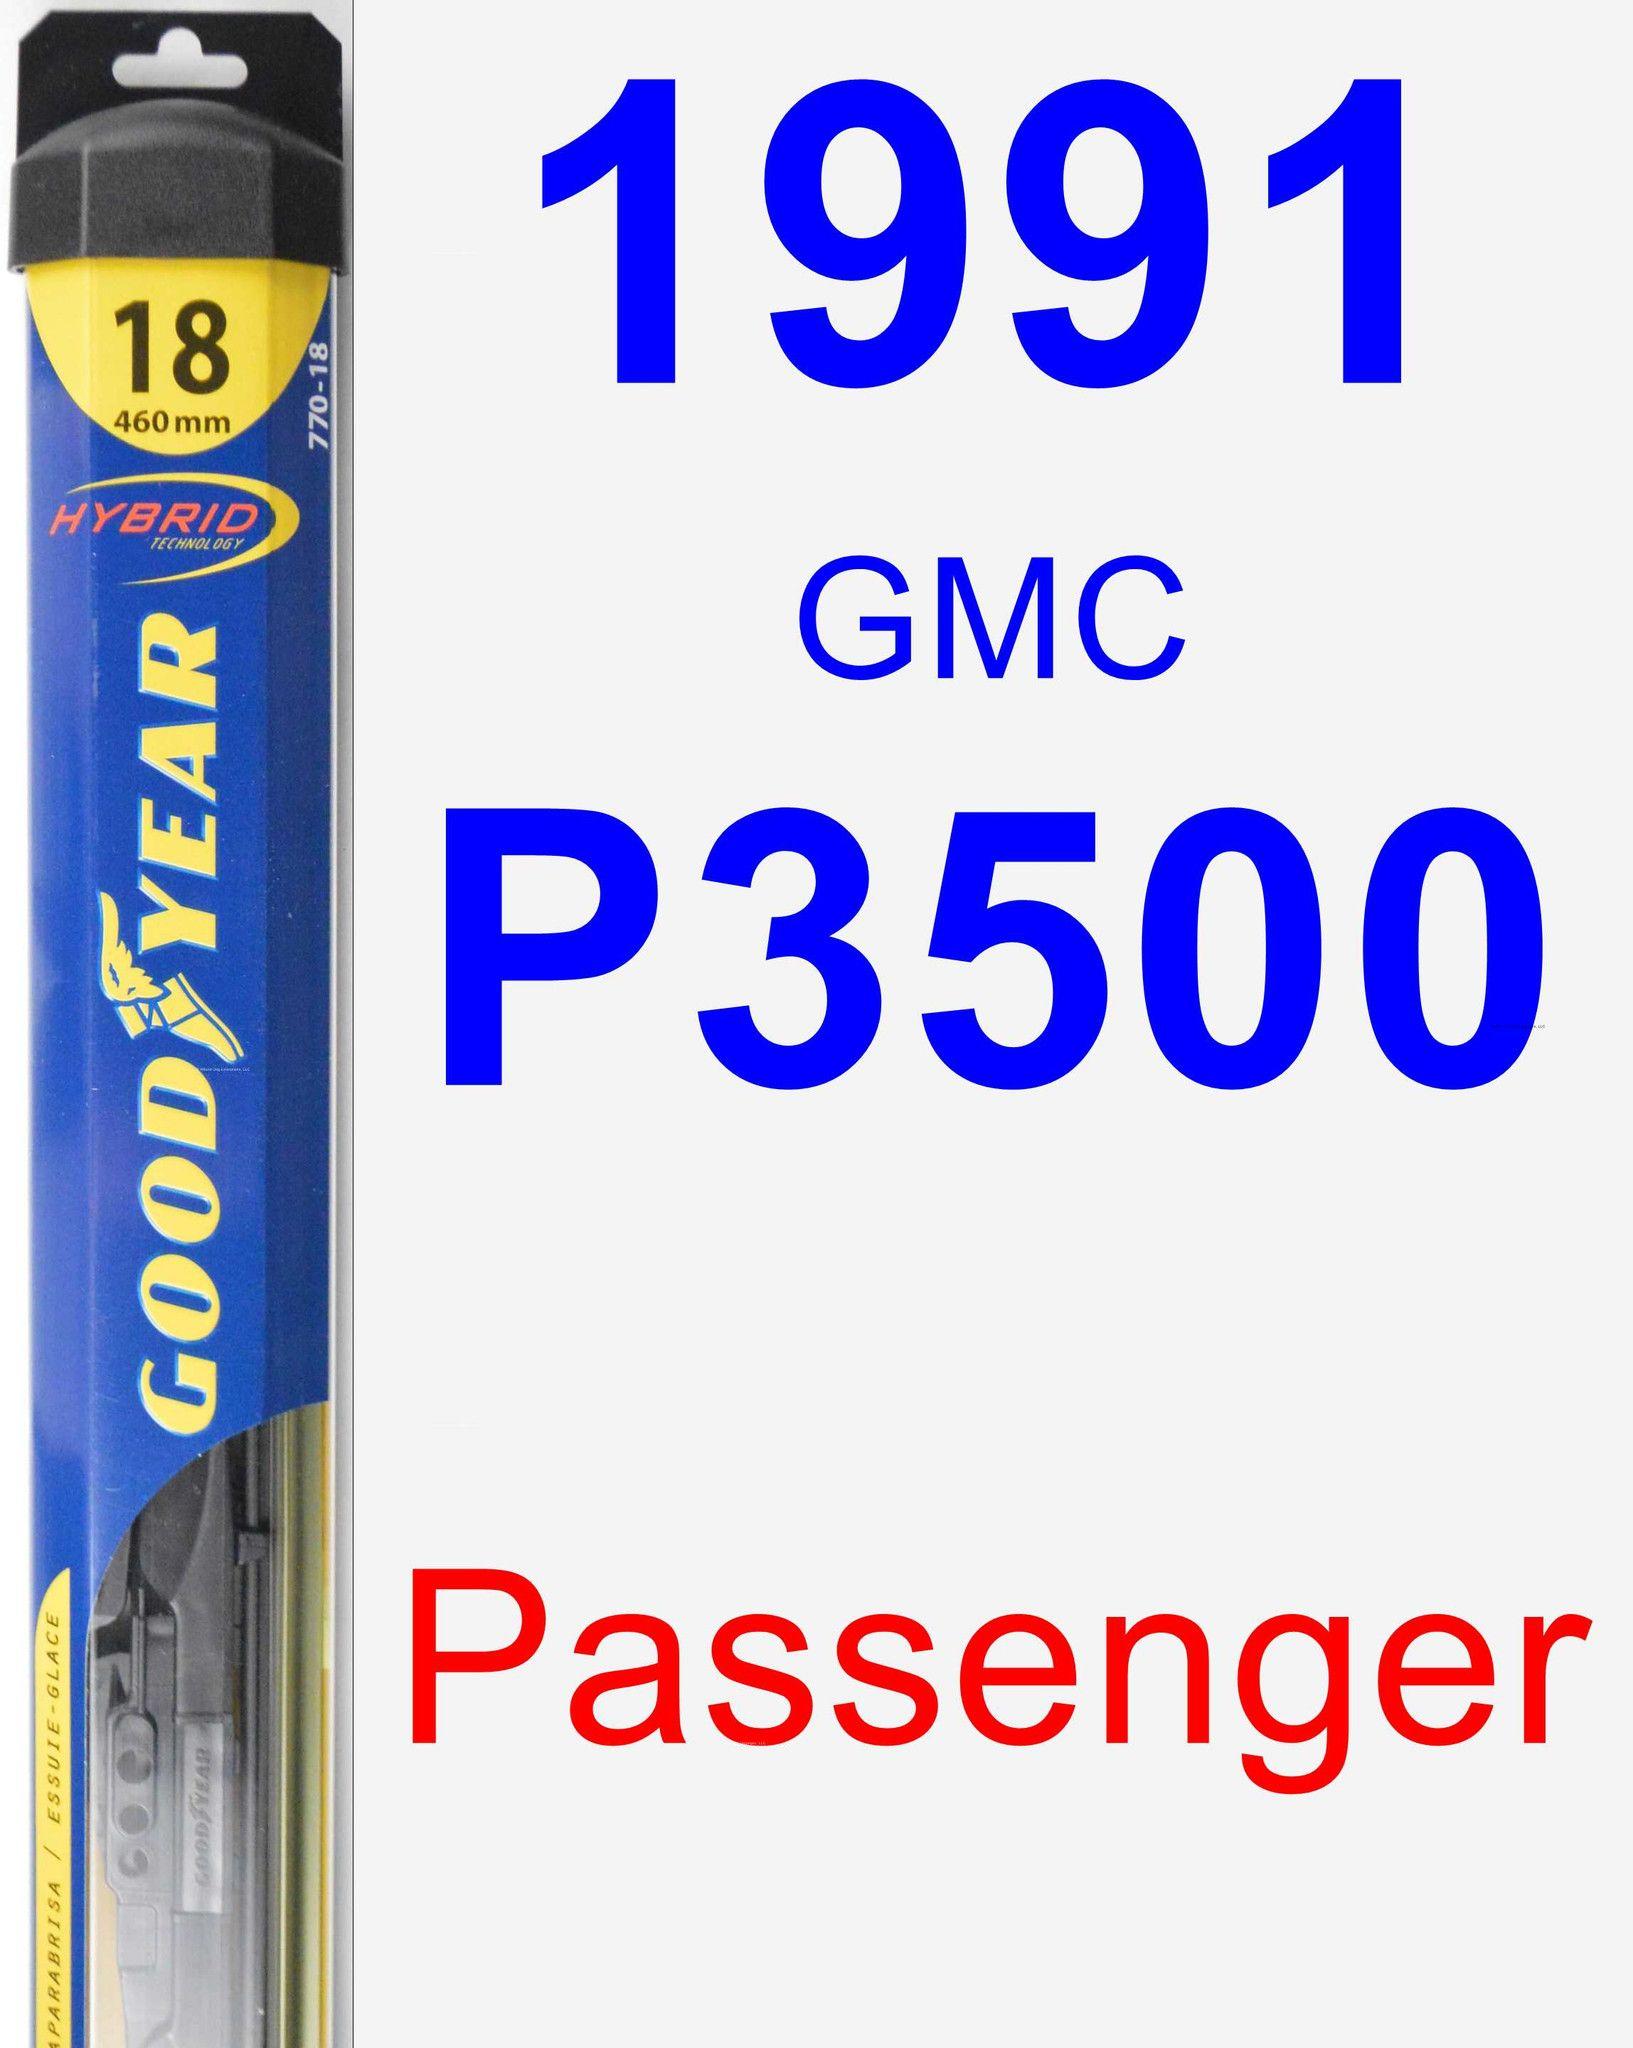 Passenger Wiper Blade For 1991 Gmc P3500 Hybrid Volkswagen Routan Buick Lesabre Audi Coupe